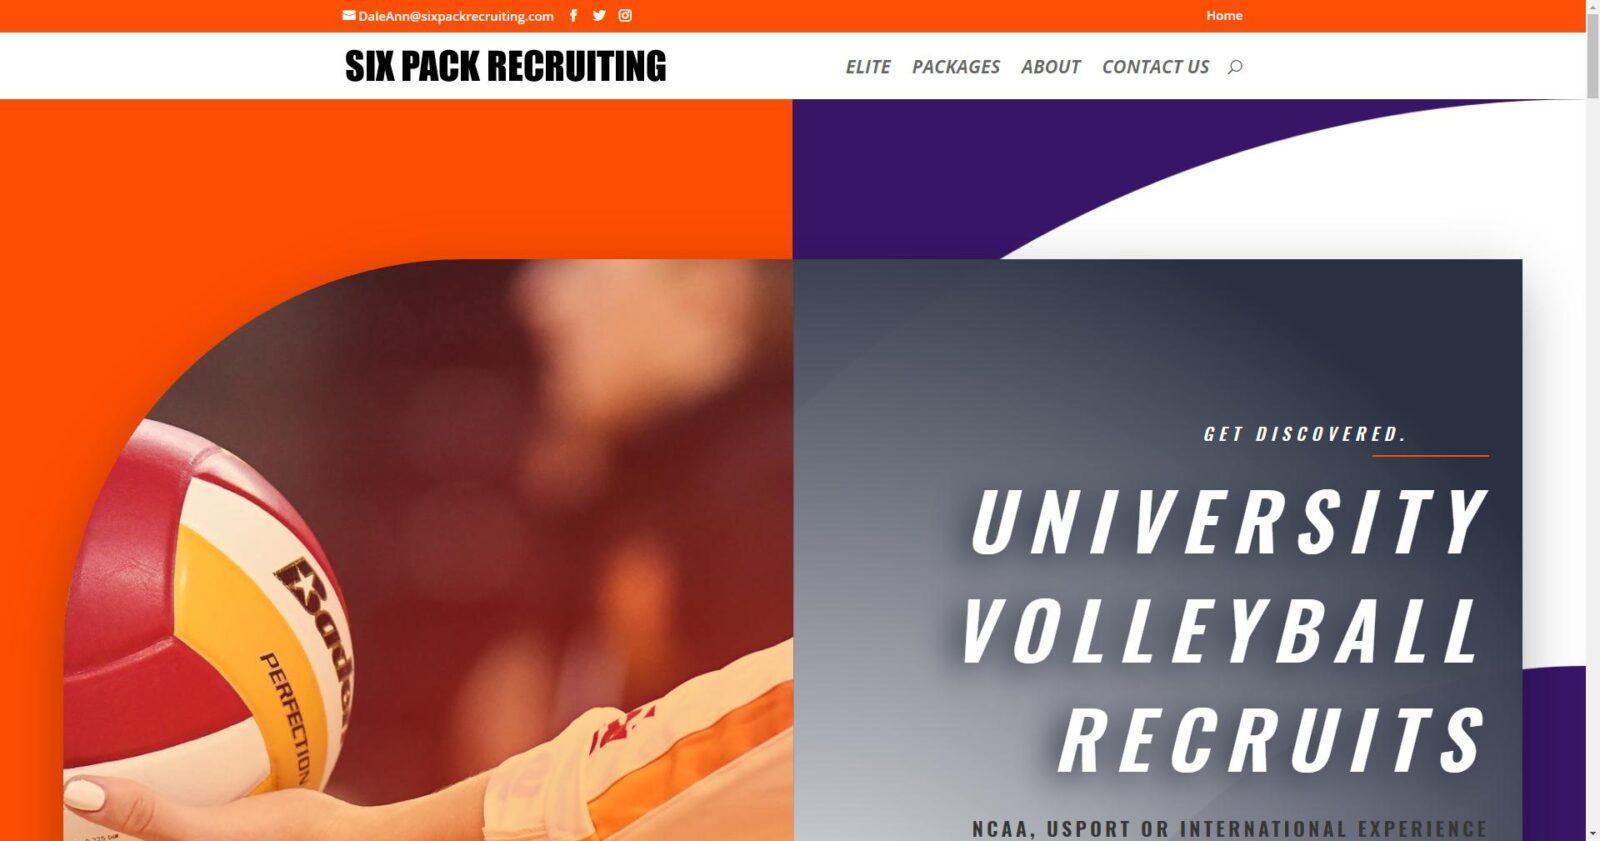 Six Pack Recruiting